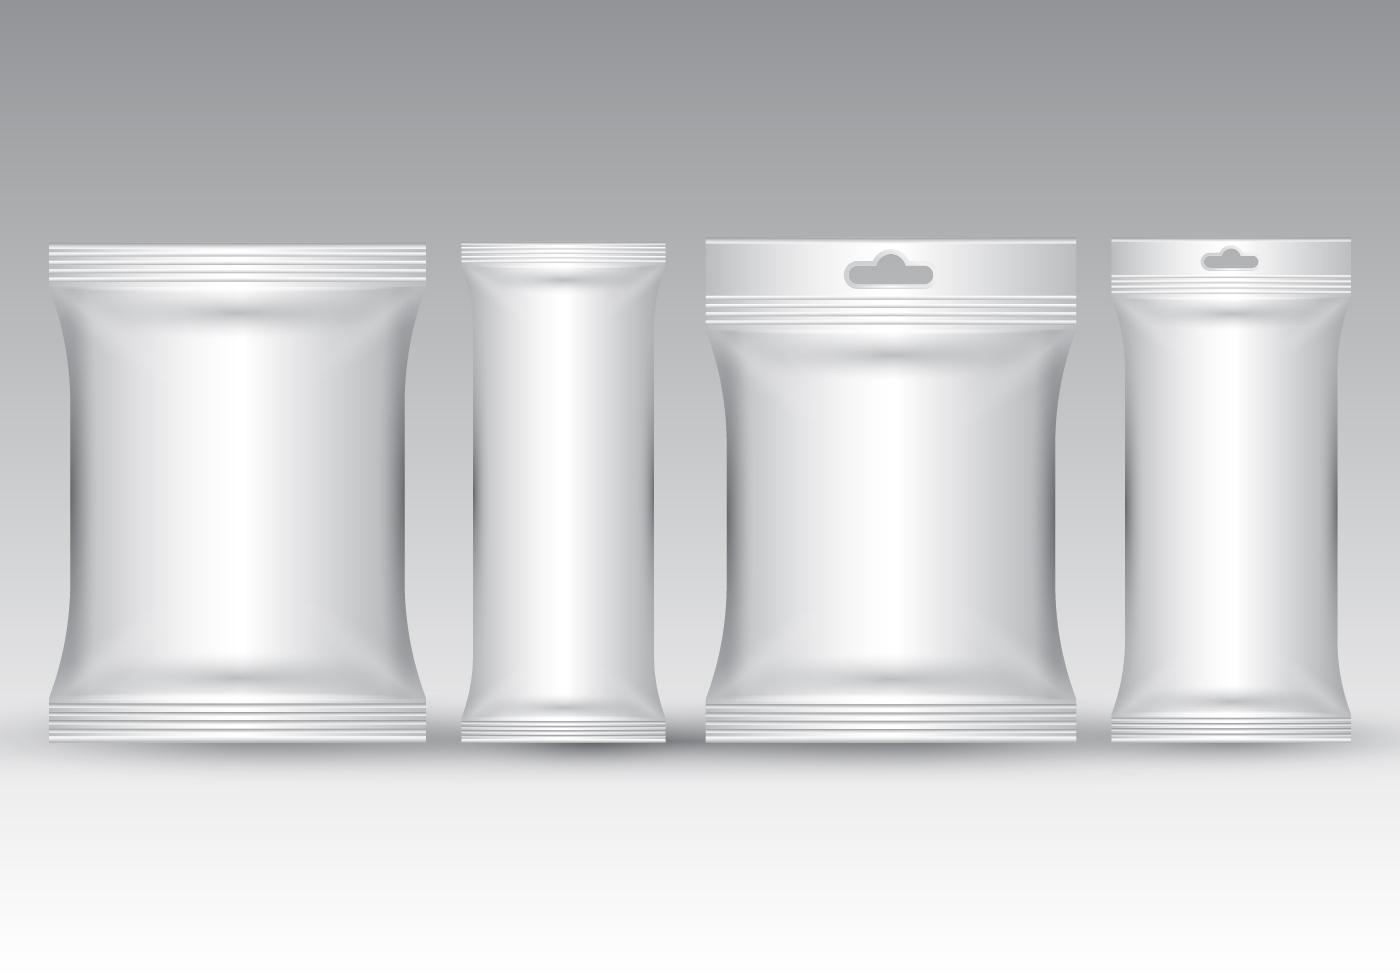 Realistic Sachet Packaging Vector Download Free Vector